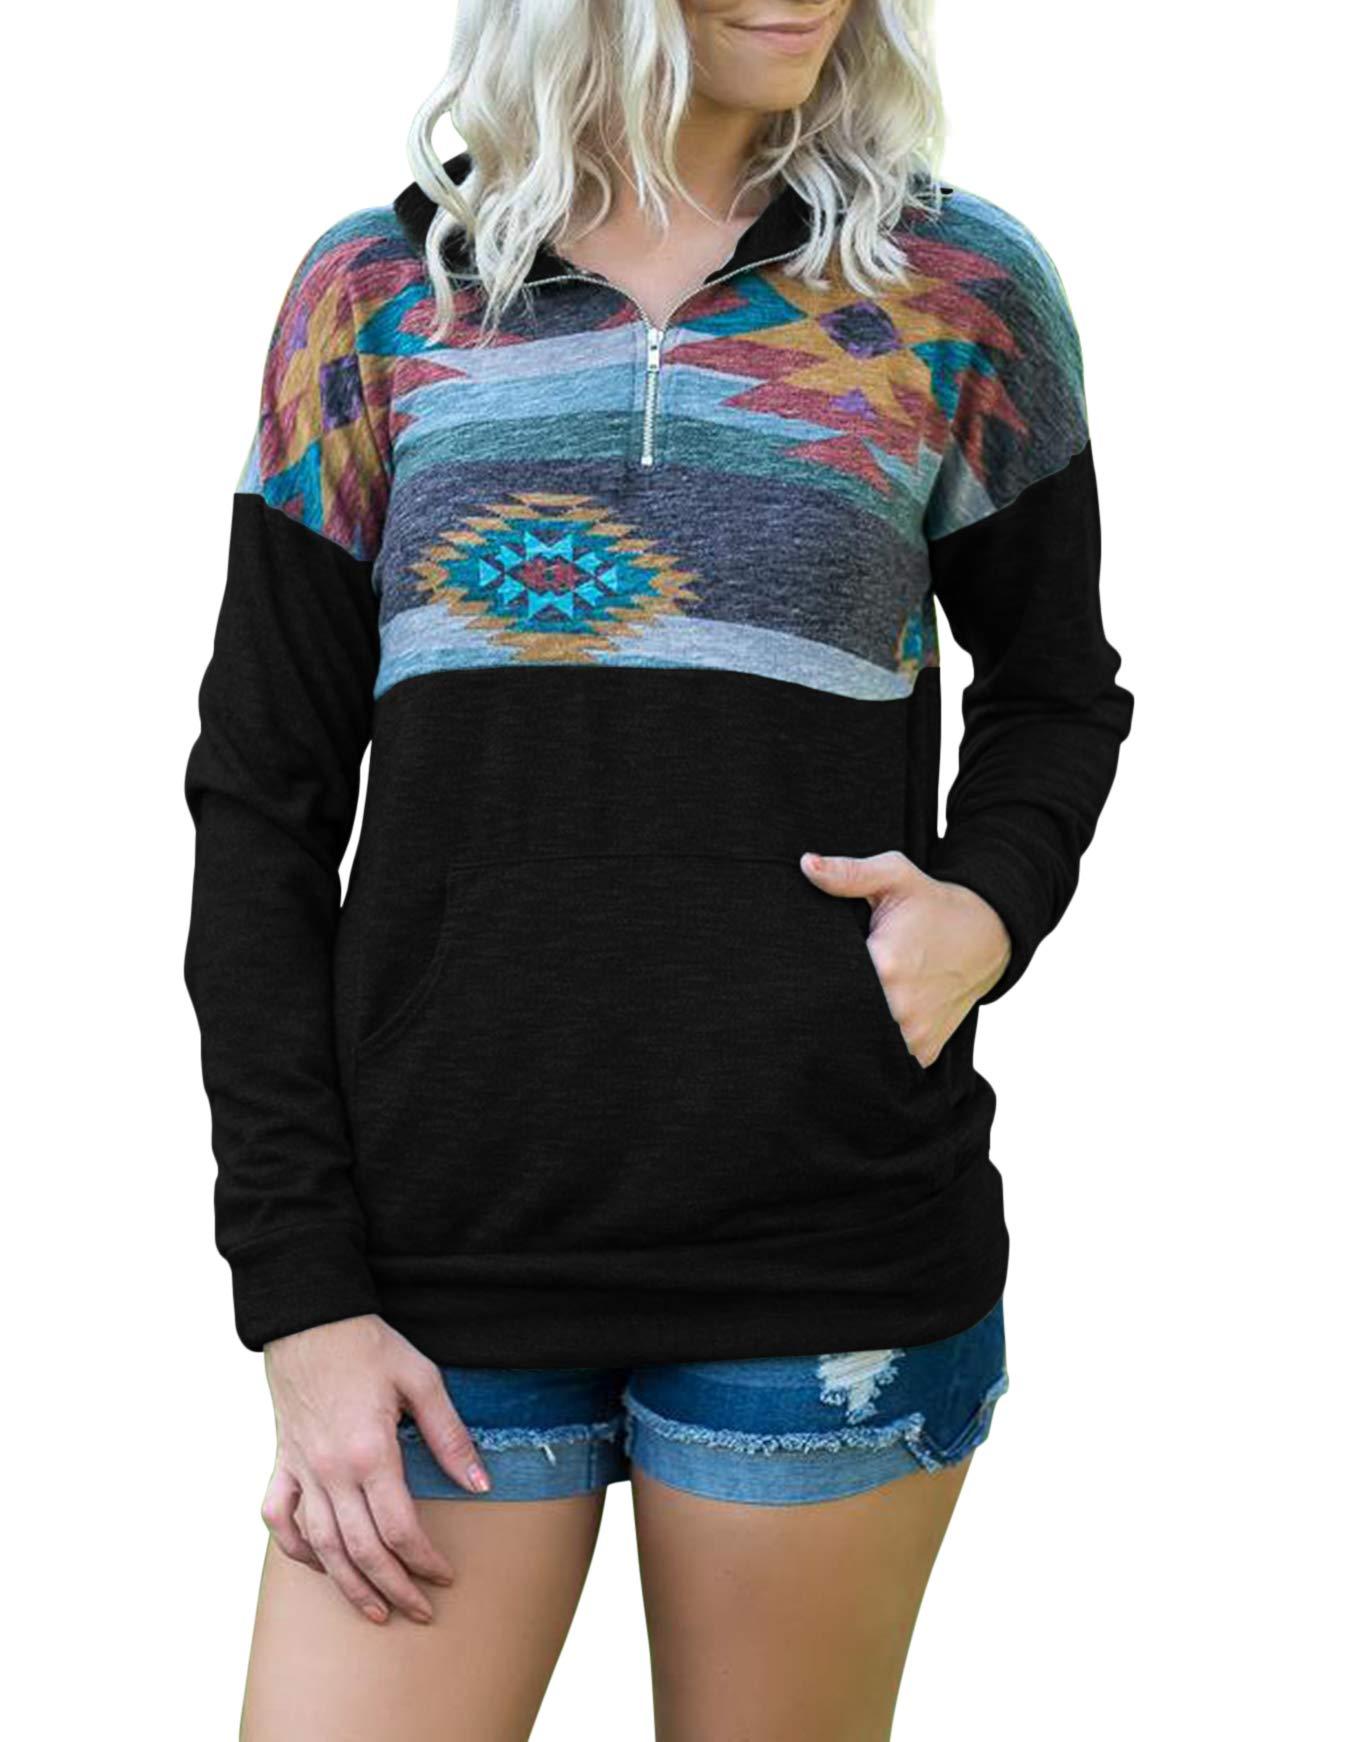 TECREW Women's 1/4 Zip Floral Printed Long Sleeve Pullover Sweatshirt Jacket Tops with Pocket